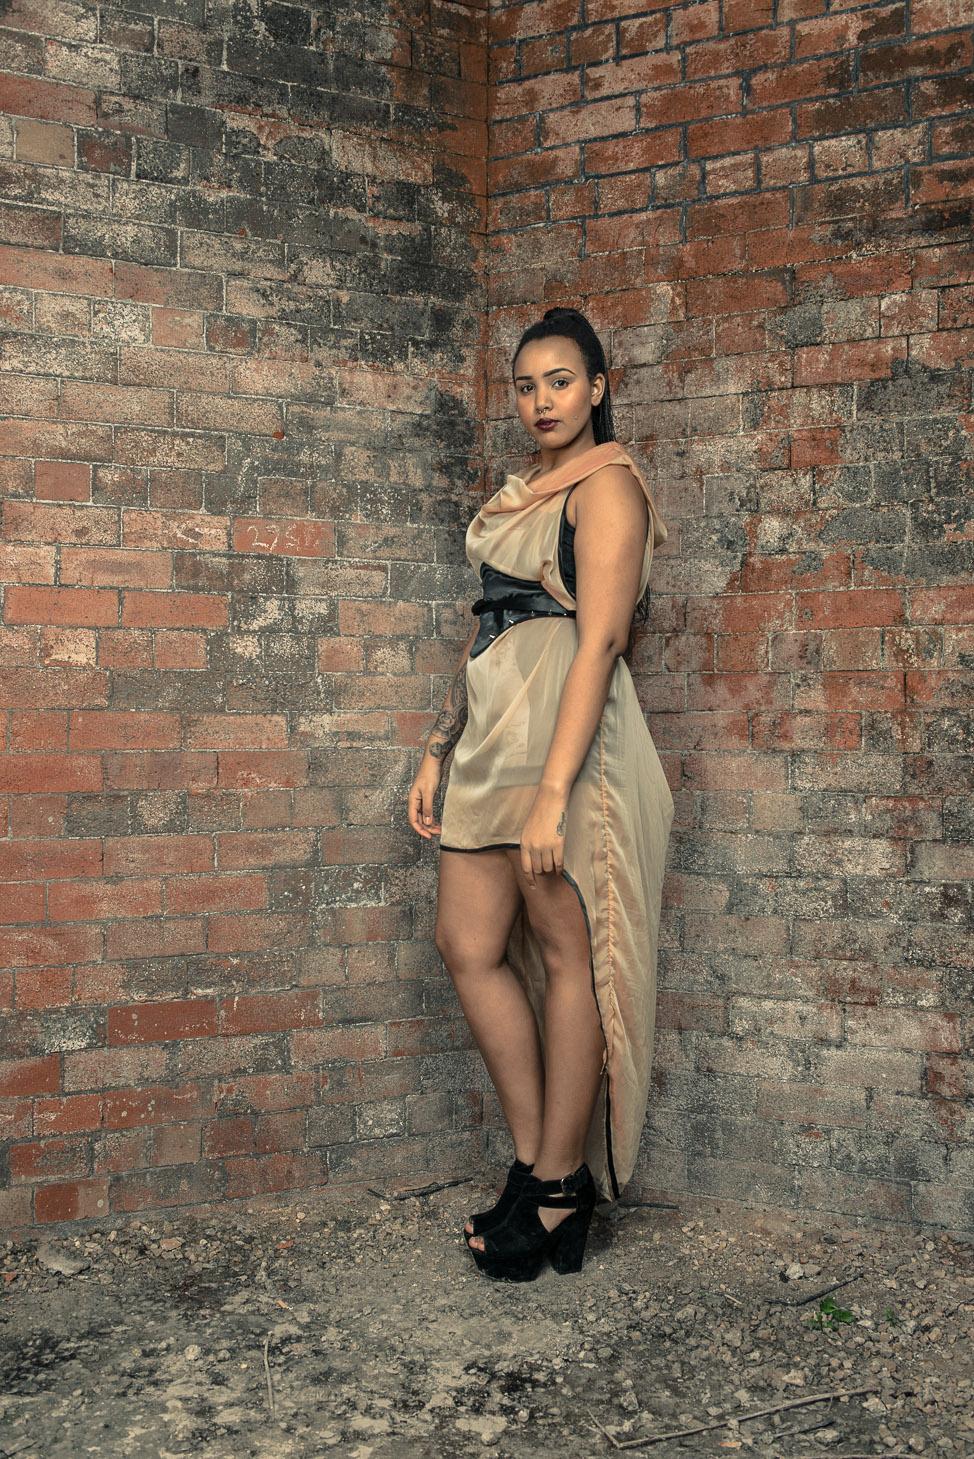 zaramia-ava-zaramiaava-leeds-fashion-designer-ethical-sustainable-tailored-minimalist-sheer-versatile-drape-dress-gold-binding-belt-wrap-cowl-styling-bodysuit-womenswear-models-photoshoot-location-4